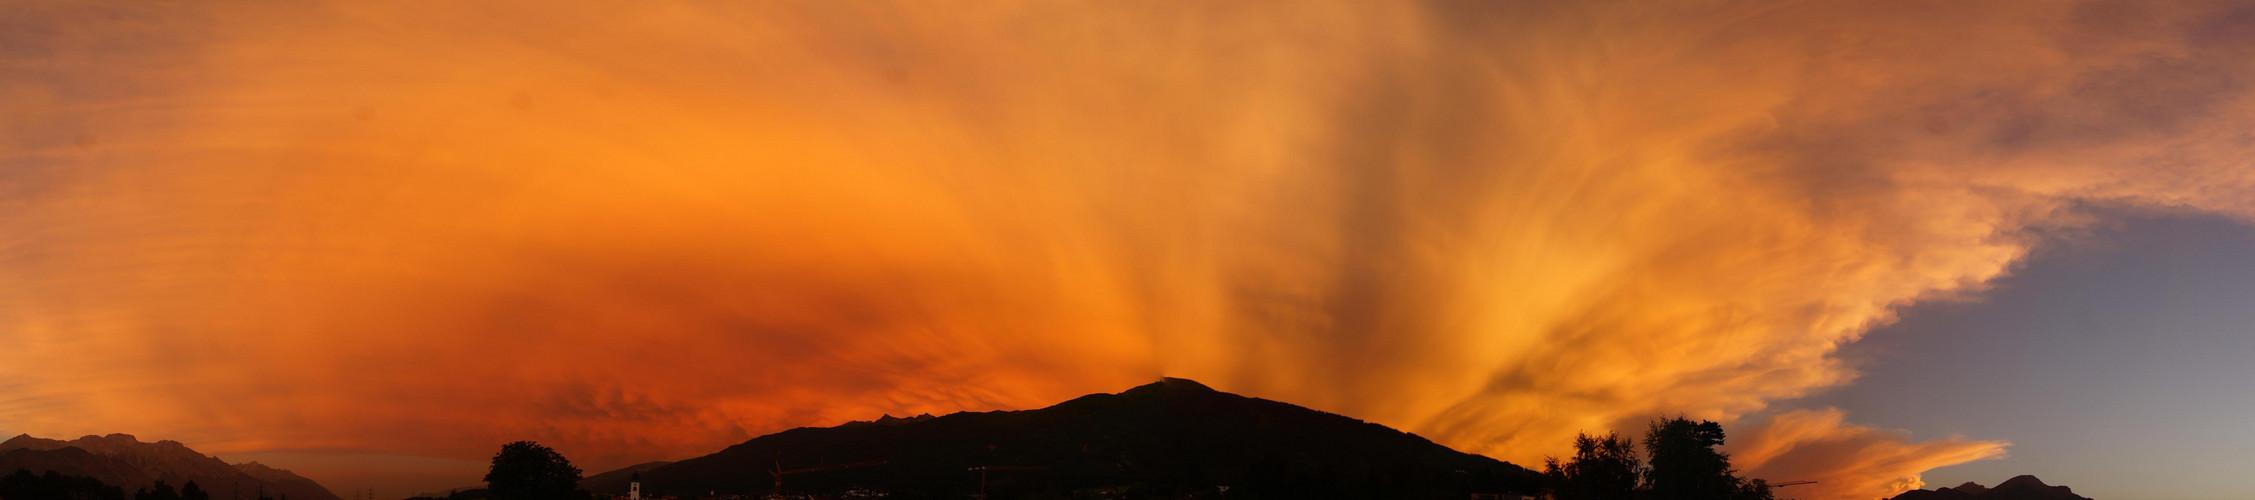 Sonnenuntergang überm Inntal